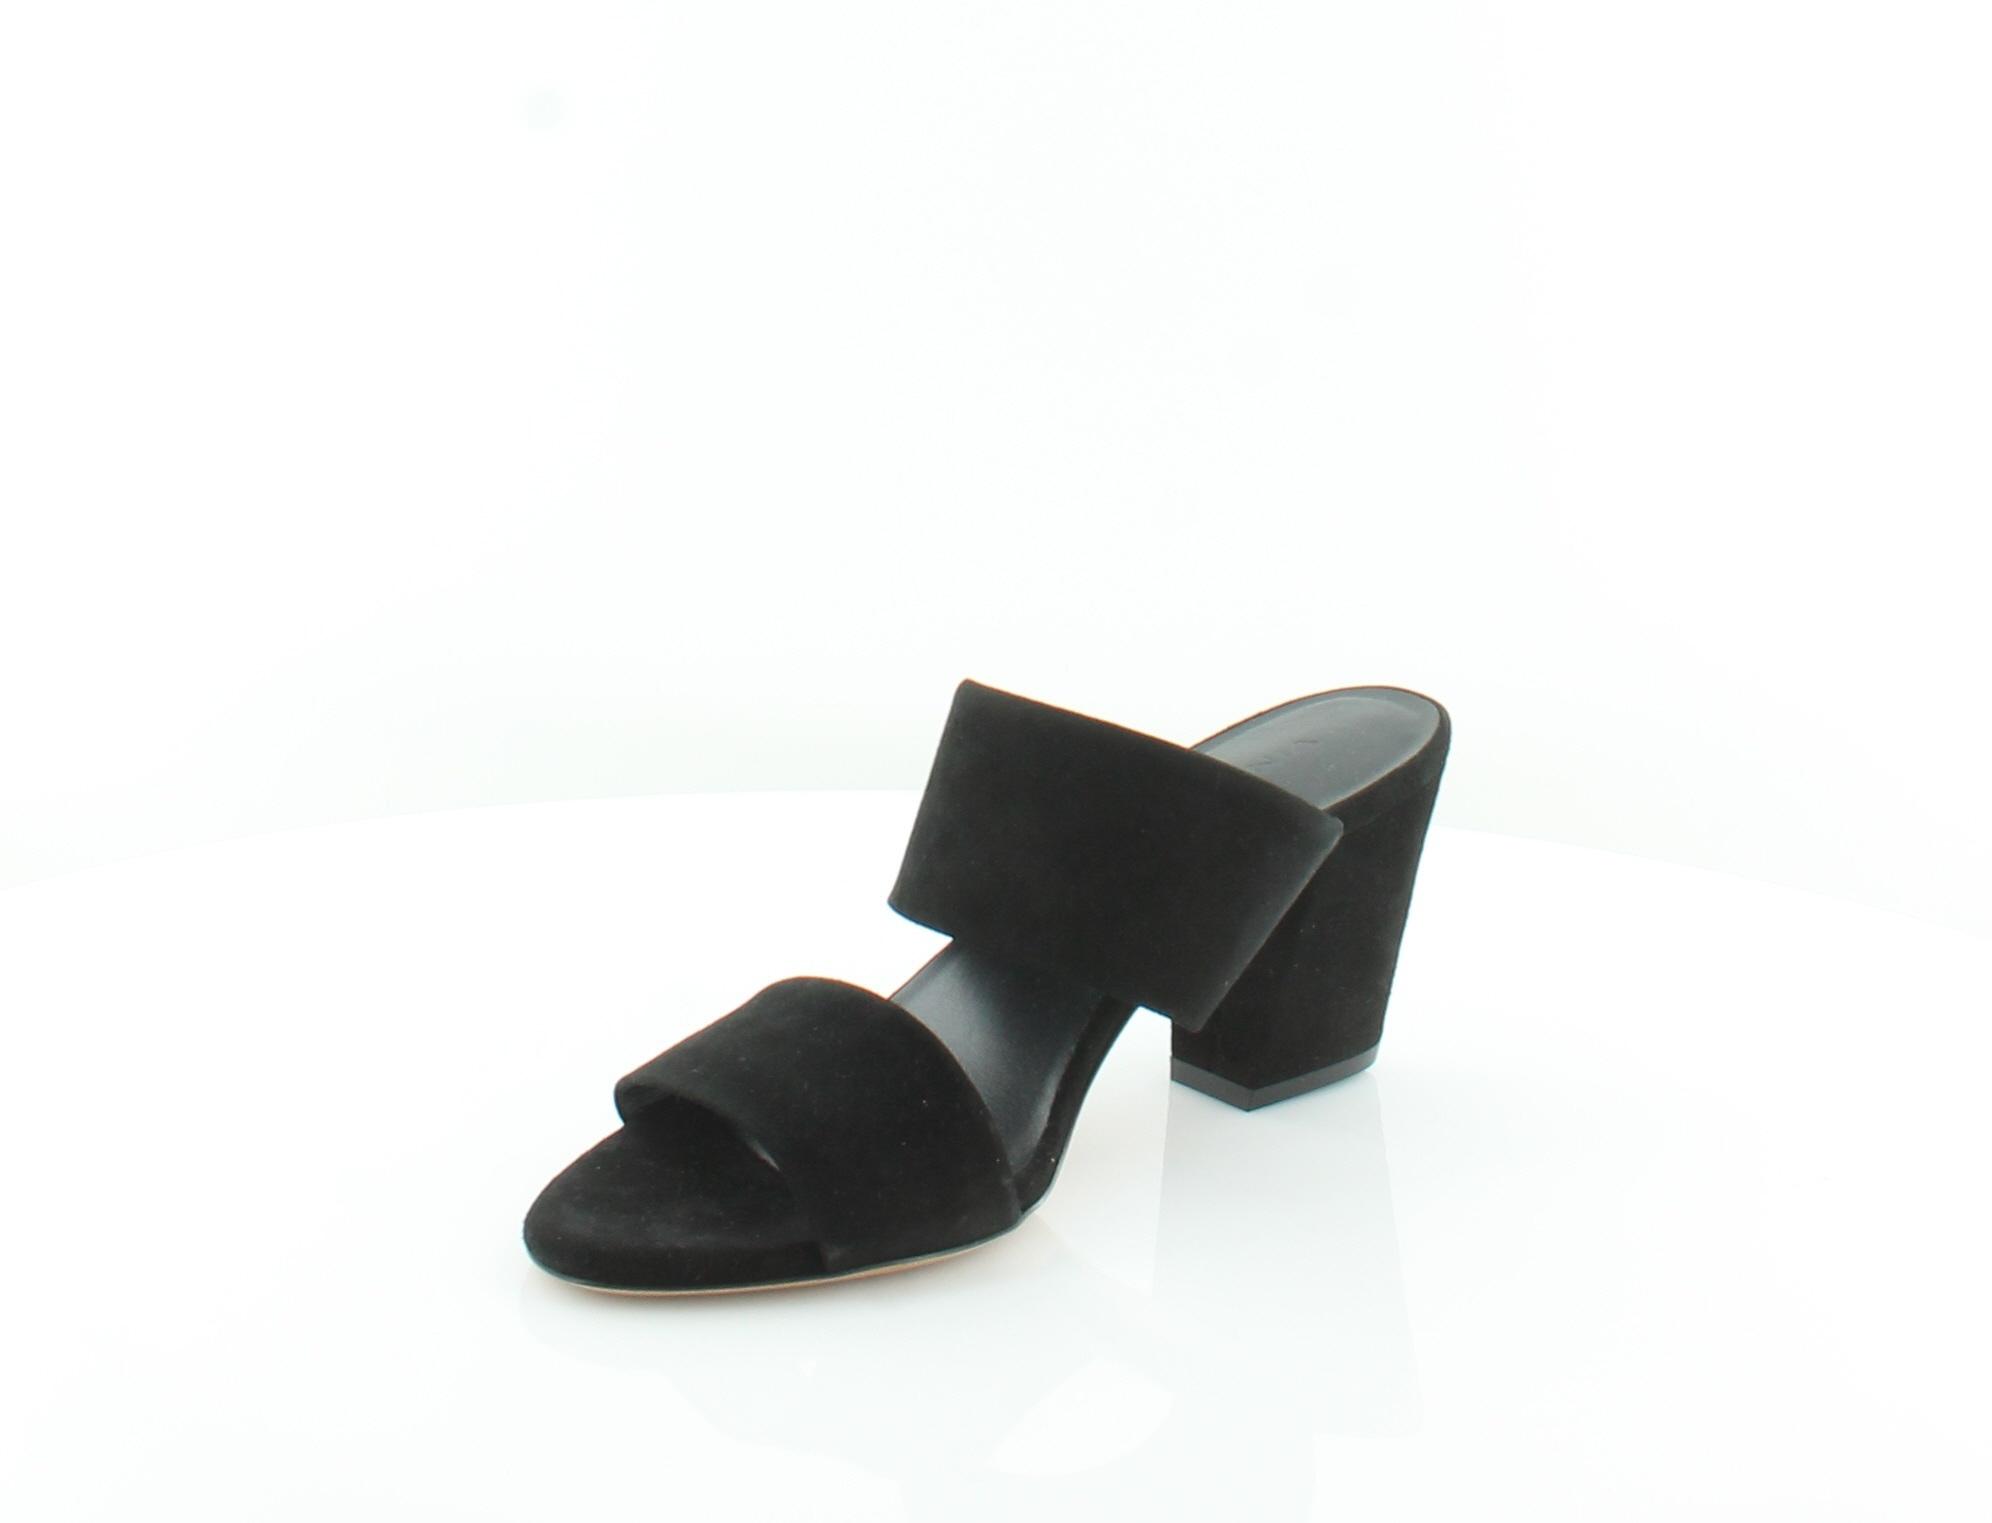 VINCE Benetta nero donna scarpe Dimensione 8.5 M Sandals Sandals Sandals MSRP  295 3a2193